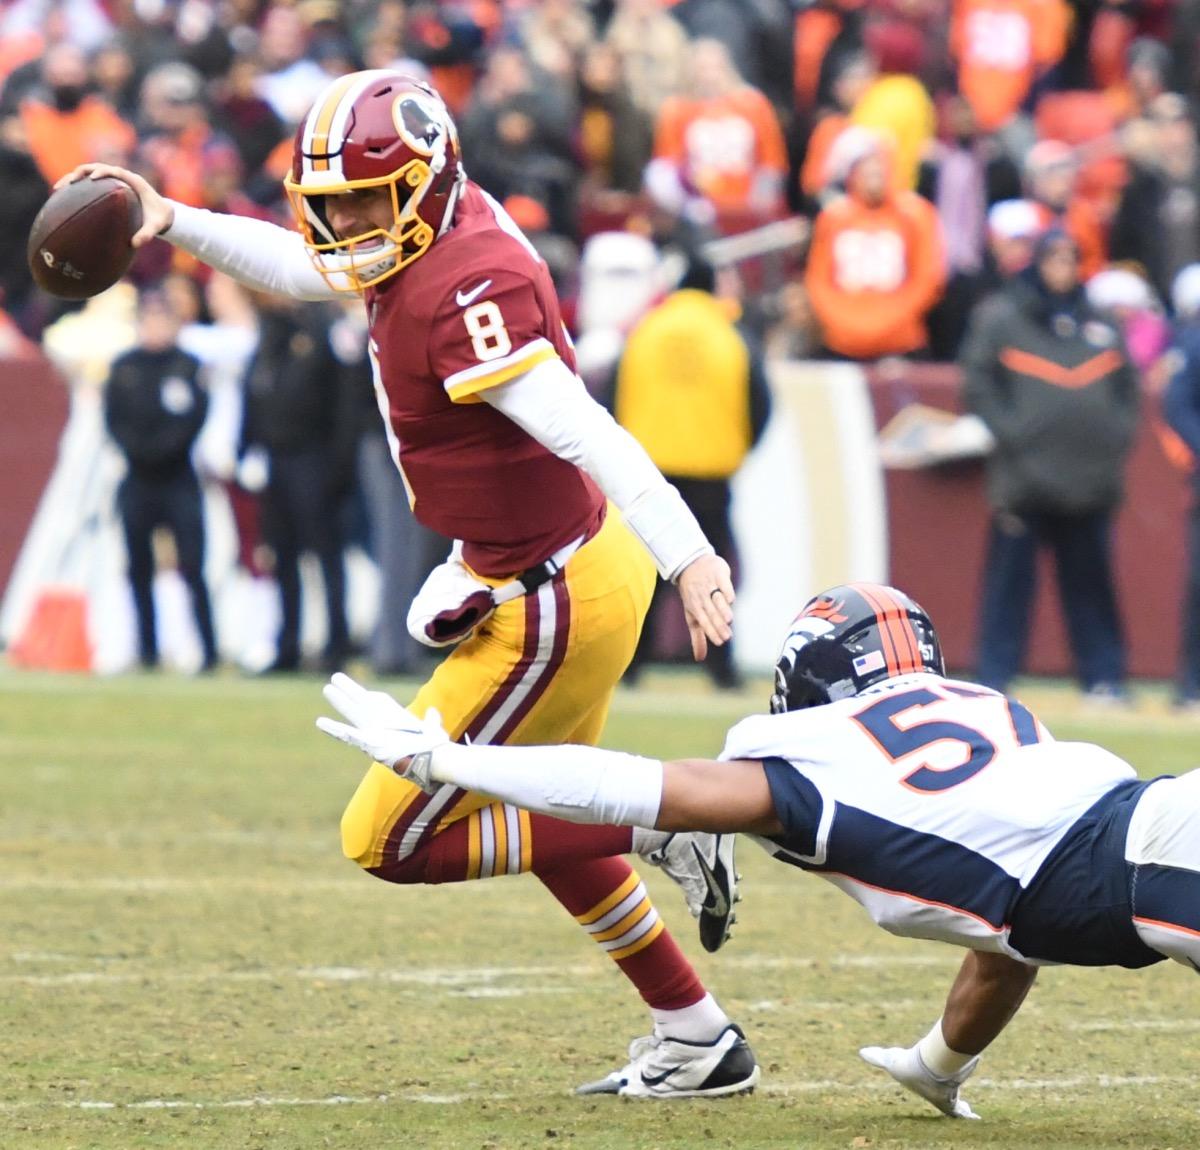 Washington Redskins quarterback Kirk Cousins slips away from Denver Broncos defensive end DeMarcus Walker during the Redskins' 27-11 win at FedEx Field in Landover, Md., on Dec. 24. (John E. De Freitas/The Washington Informer)